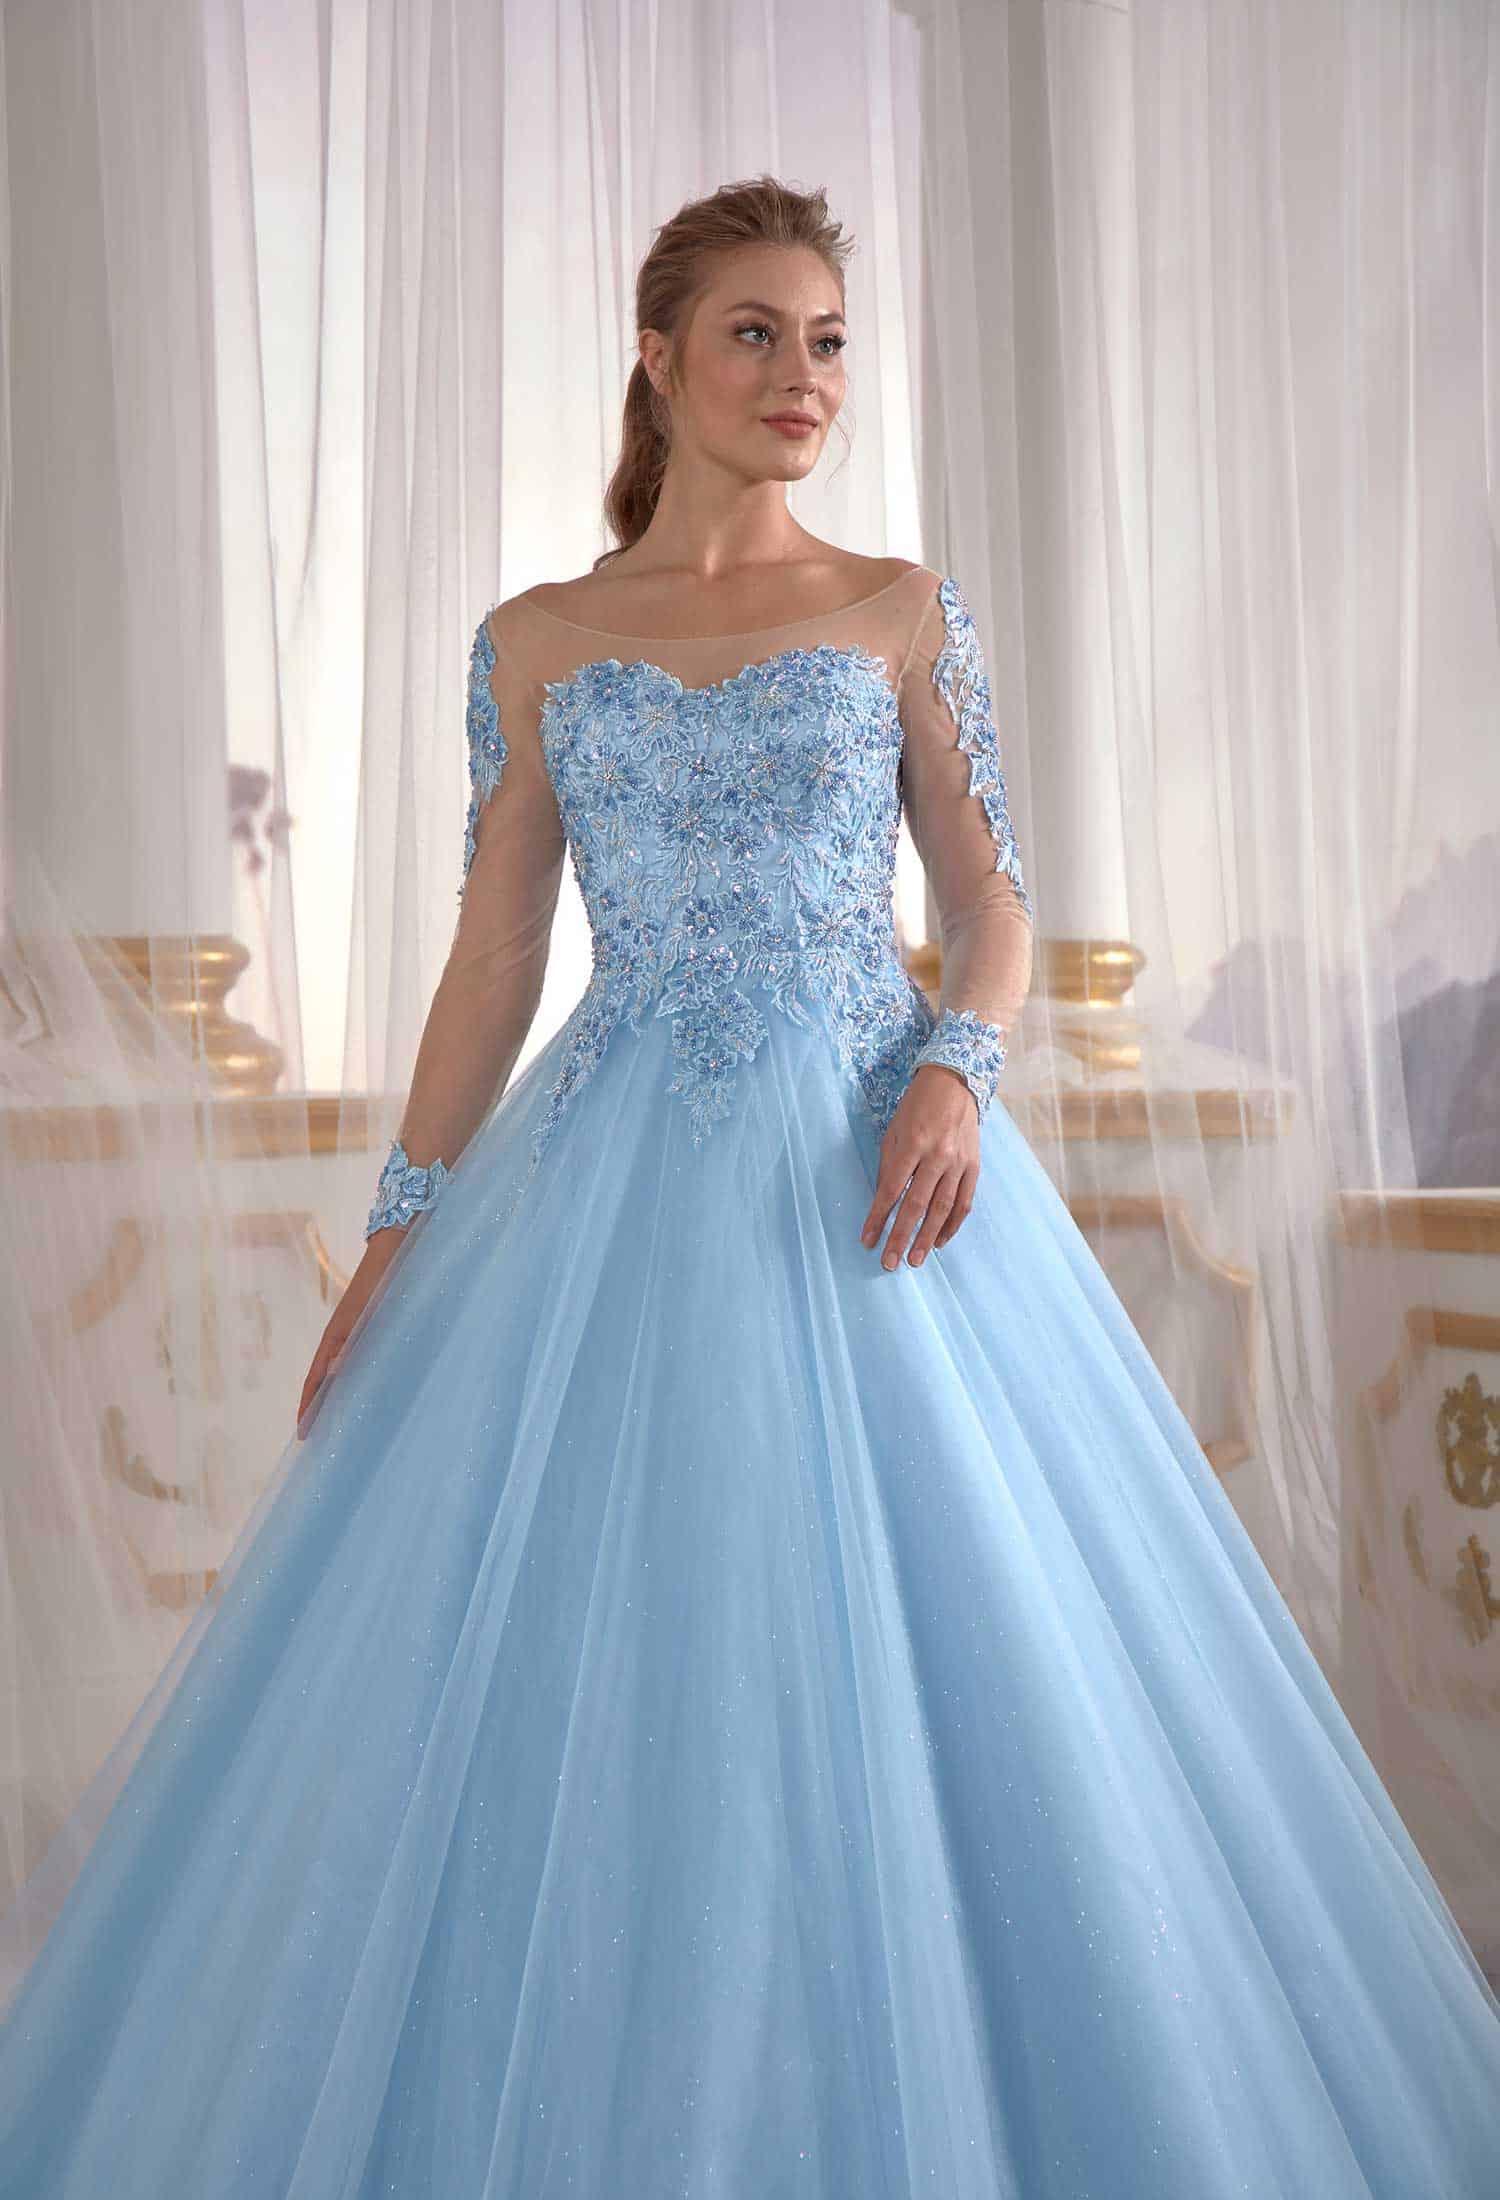 İce Blue Tulle Engagement Dress Pleated Open Back Embellished Top Detail  Cold Shoulder ⋆ Sultan Dress Ottoman Caftan